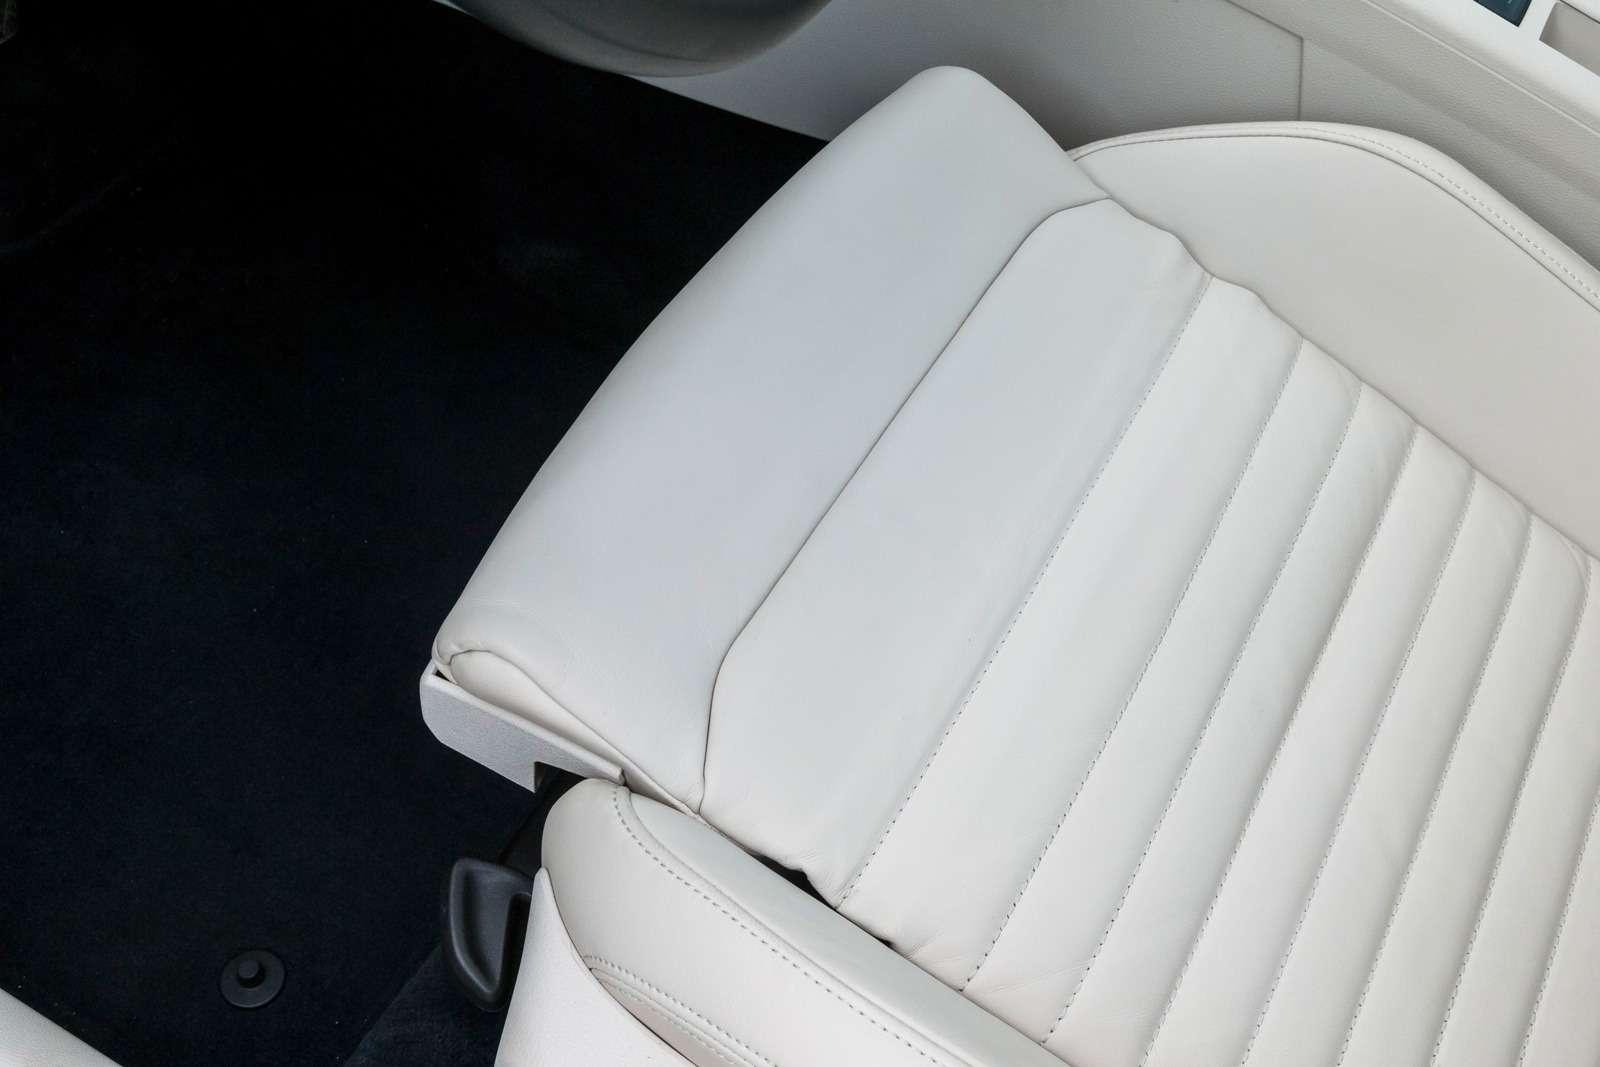 306-Passat_Mondeo_Mazda-6-zr09-15